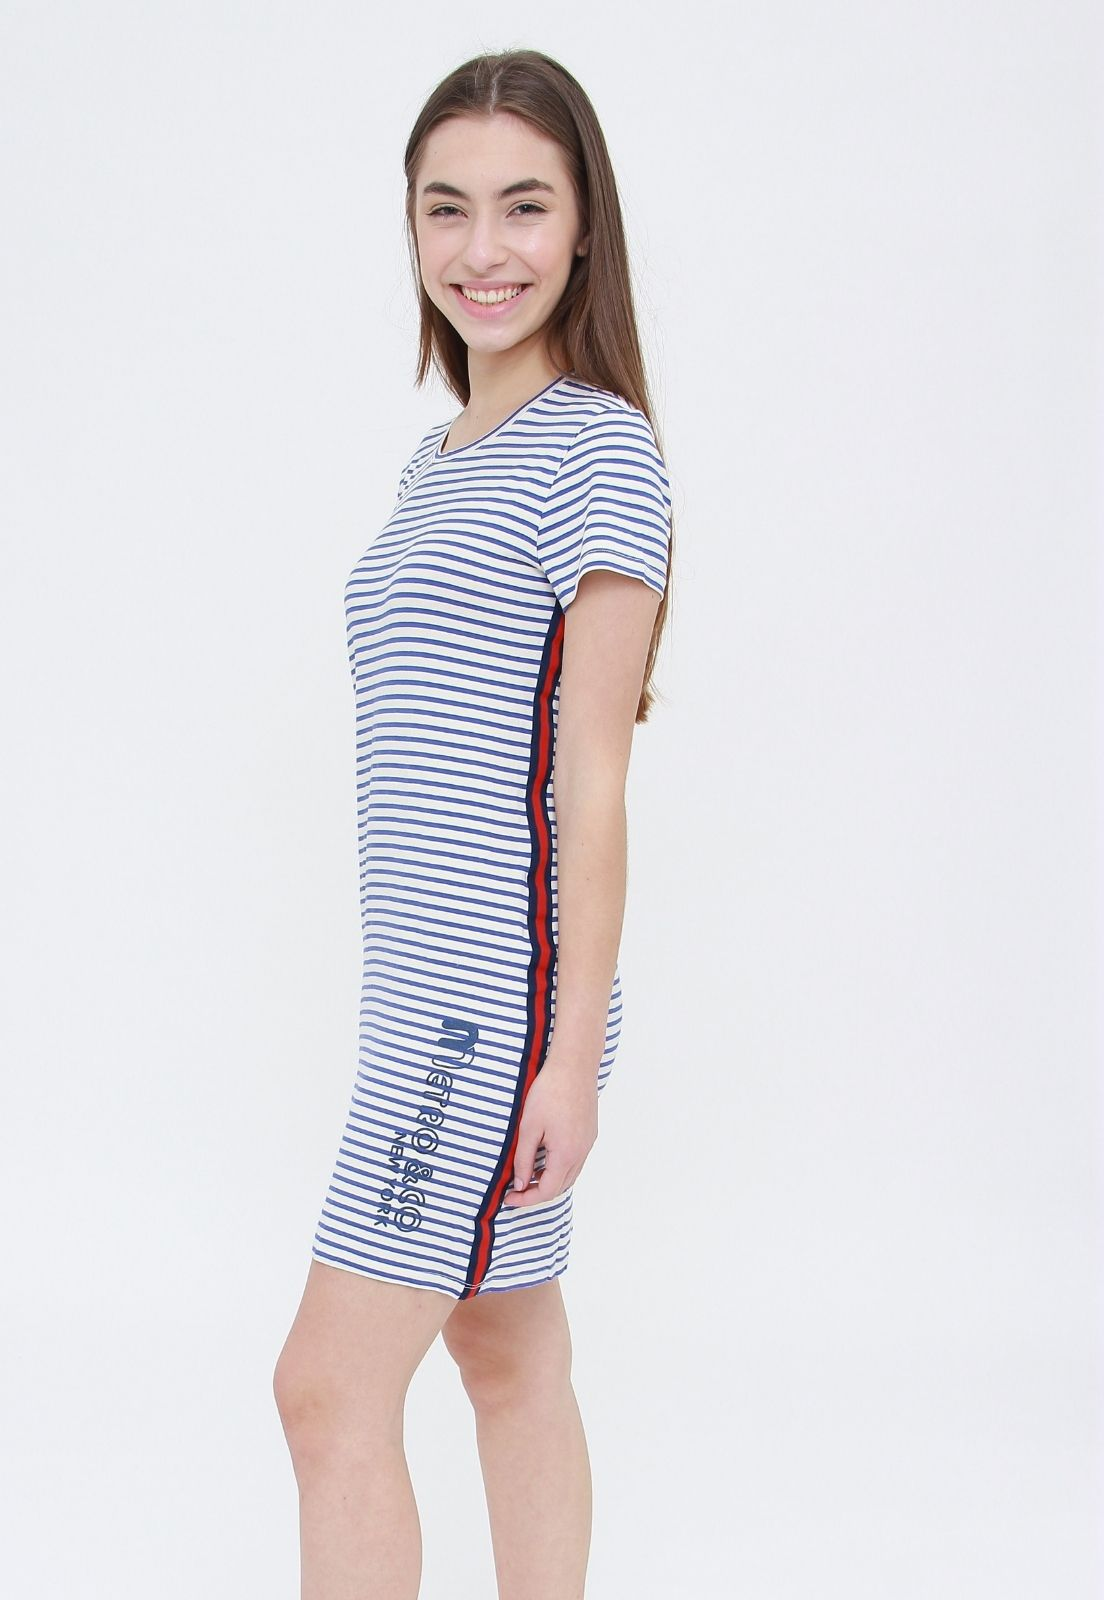 Vestido Tee Blue Stripes  - Metro & Co.